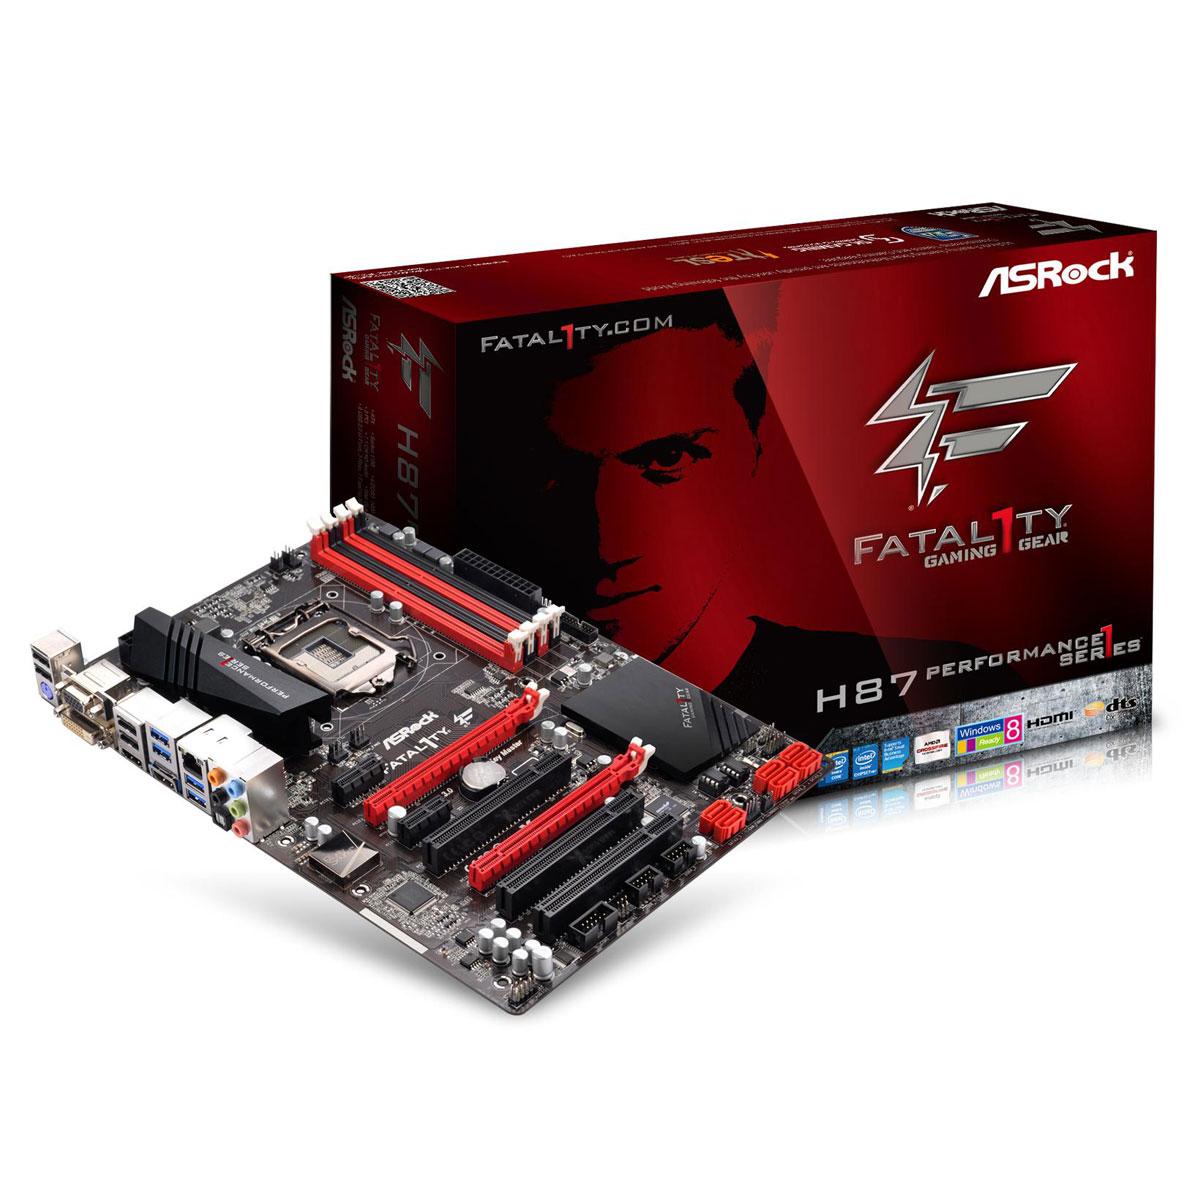 Carte mère ASRock H87 Performance Carte mère ATX Socket 1150 Intel H87 Express - SATA 6Gb/s - USB 3.0 - 1x PCI-Express 3.0 16x + 1x PCI-Express 2.0 16x